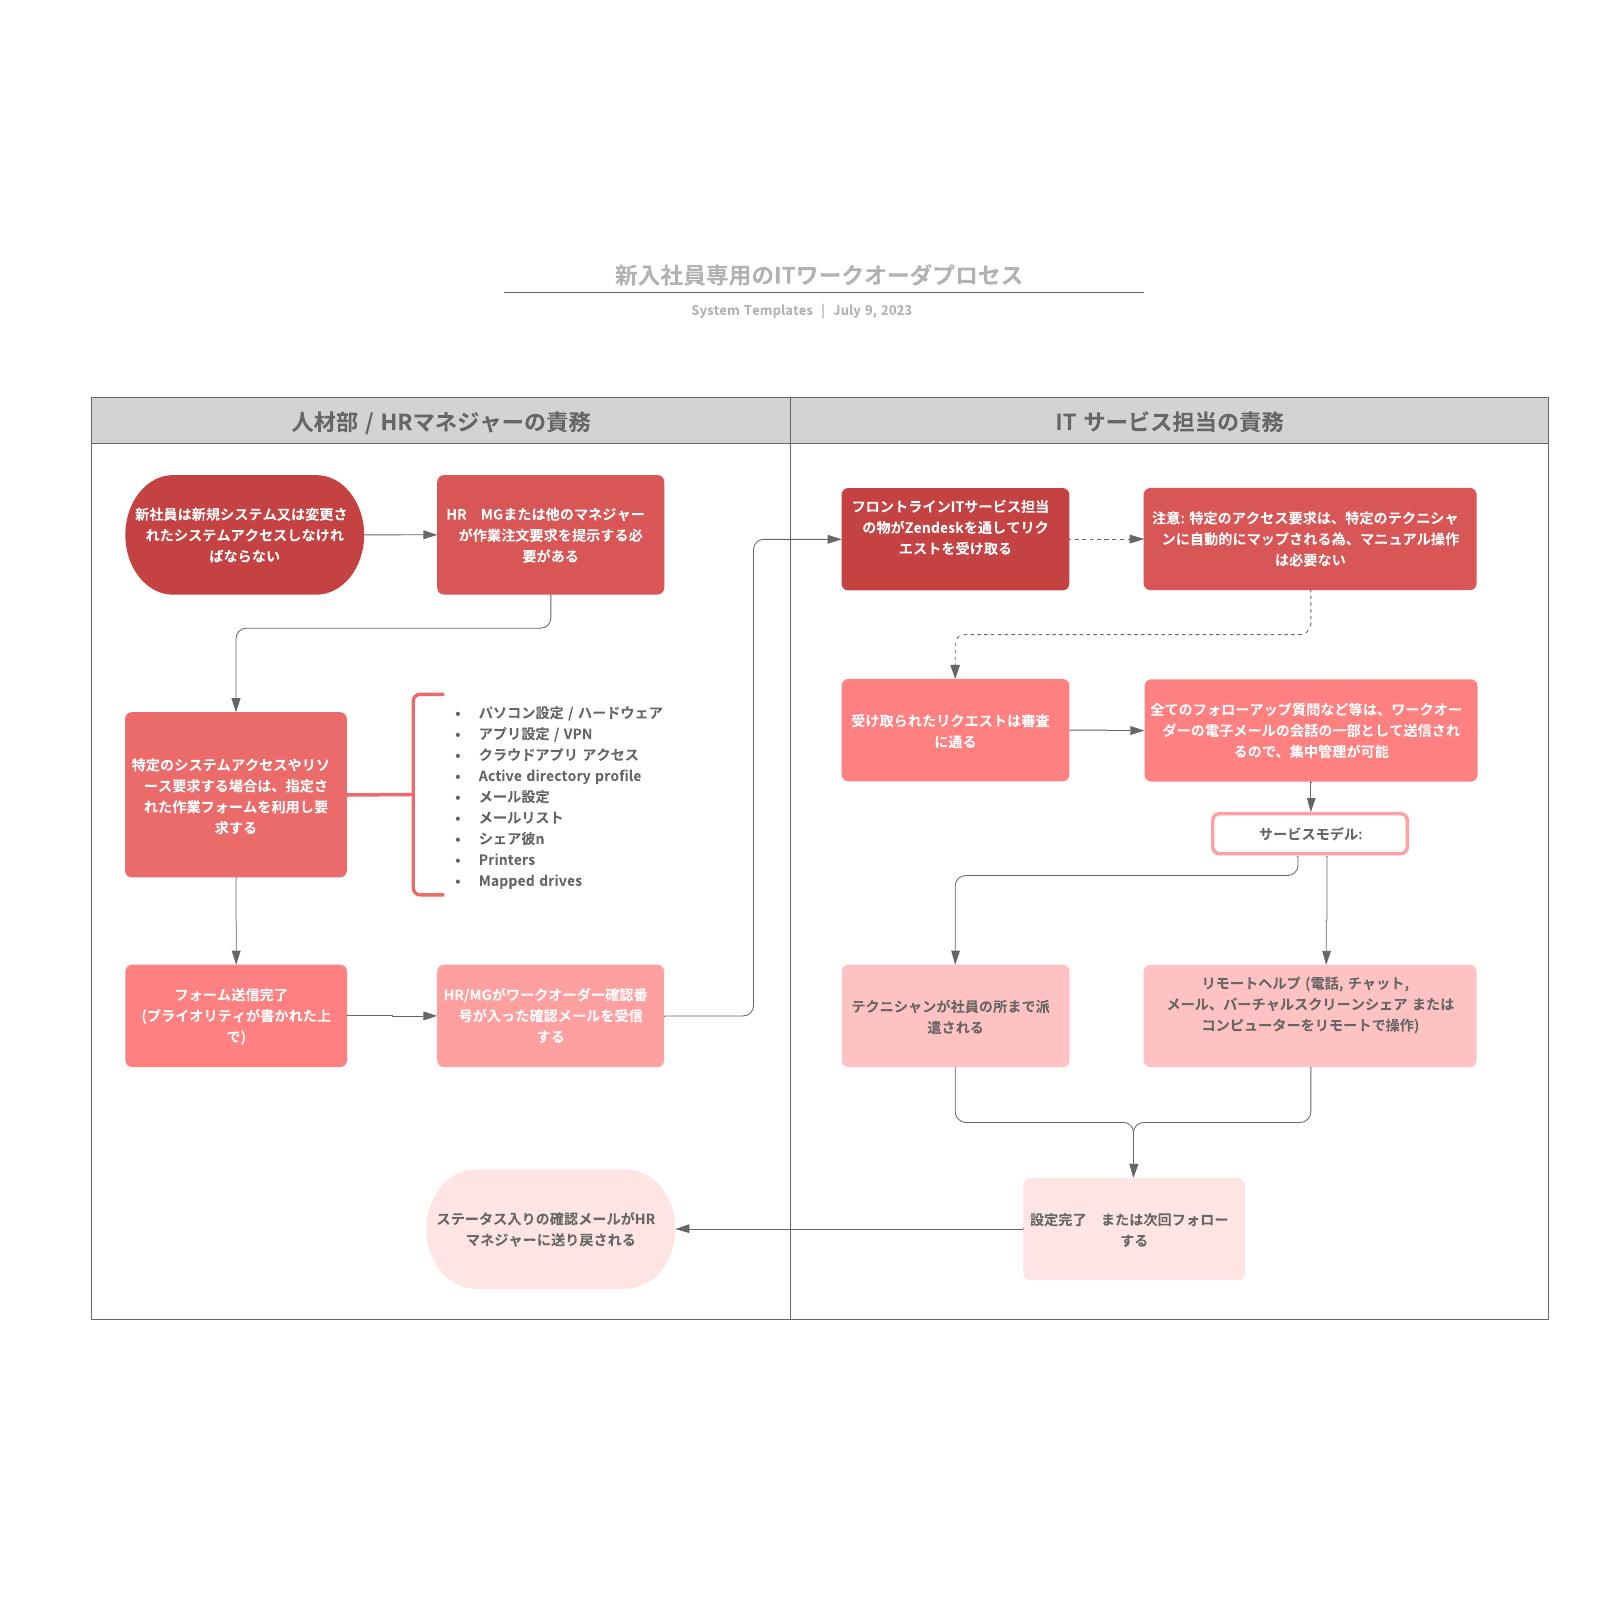 itワークオーダプロセスフロー図テンプレート